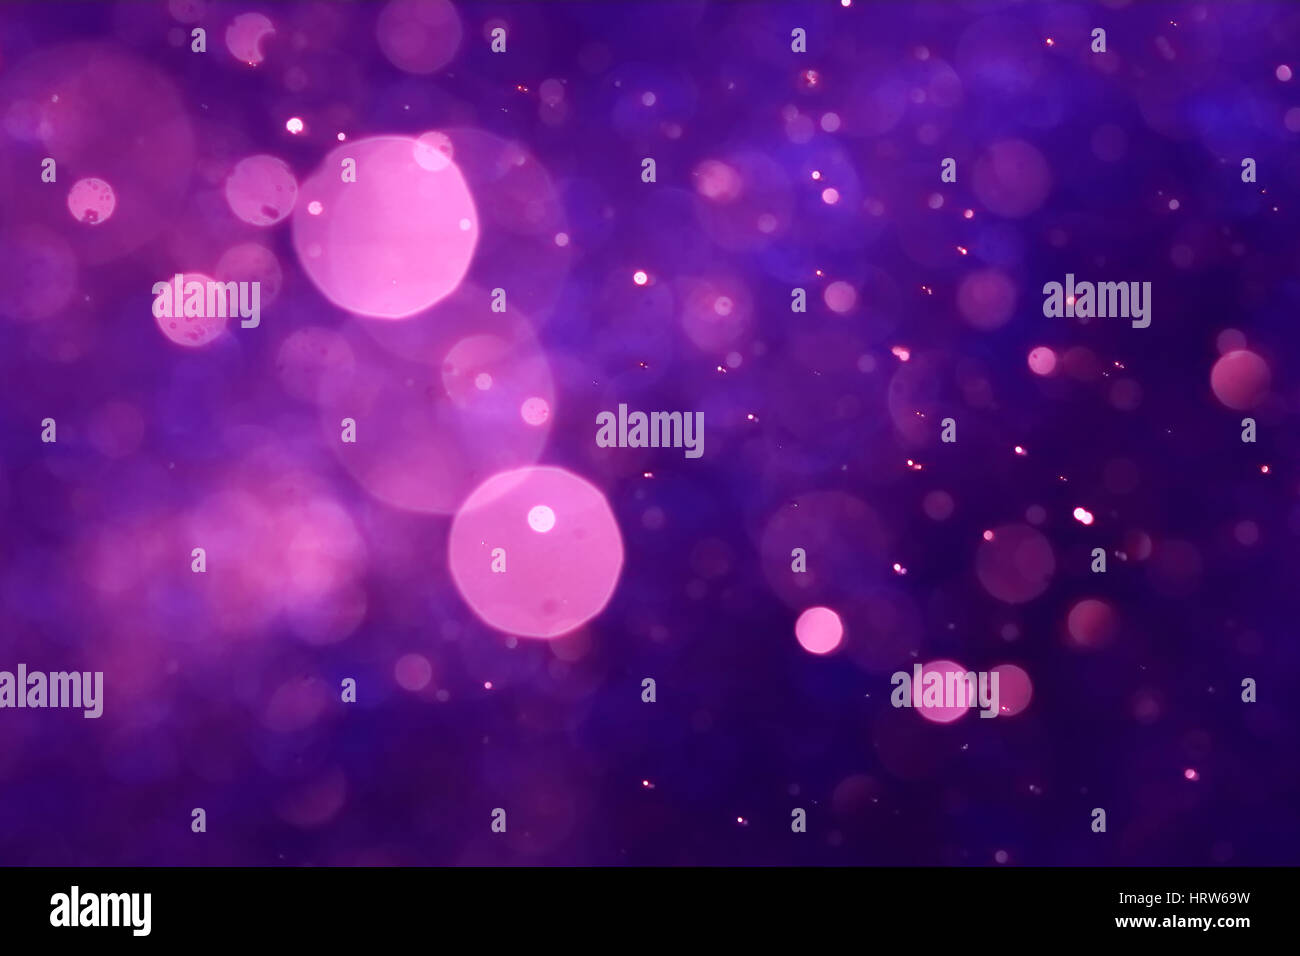 Rosa bokeh de fondo abstracto púrpura causada por el agua de pulverización. Foto de stock